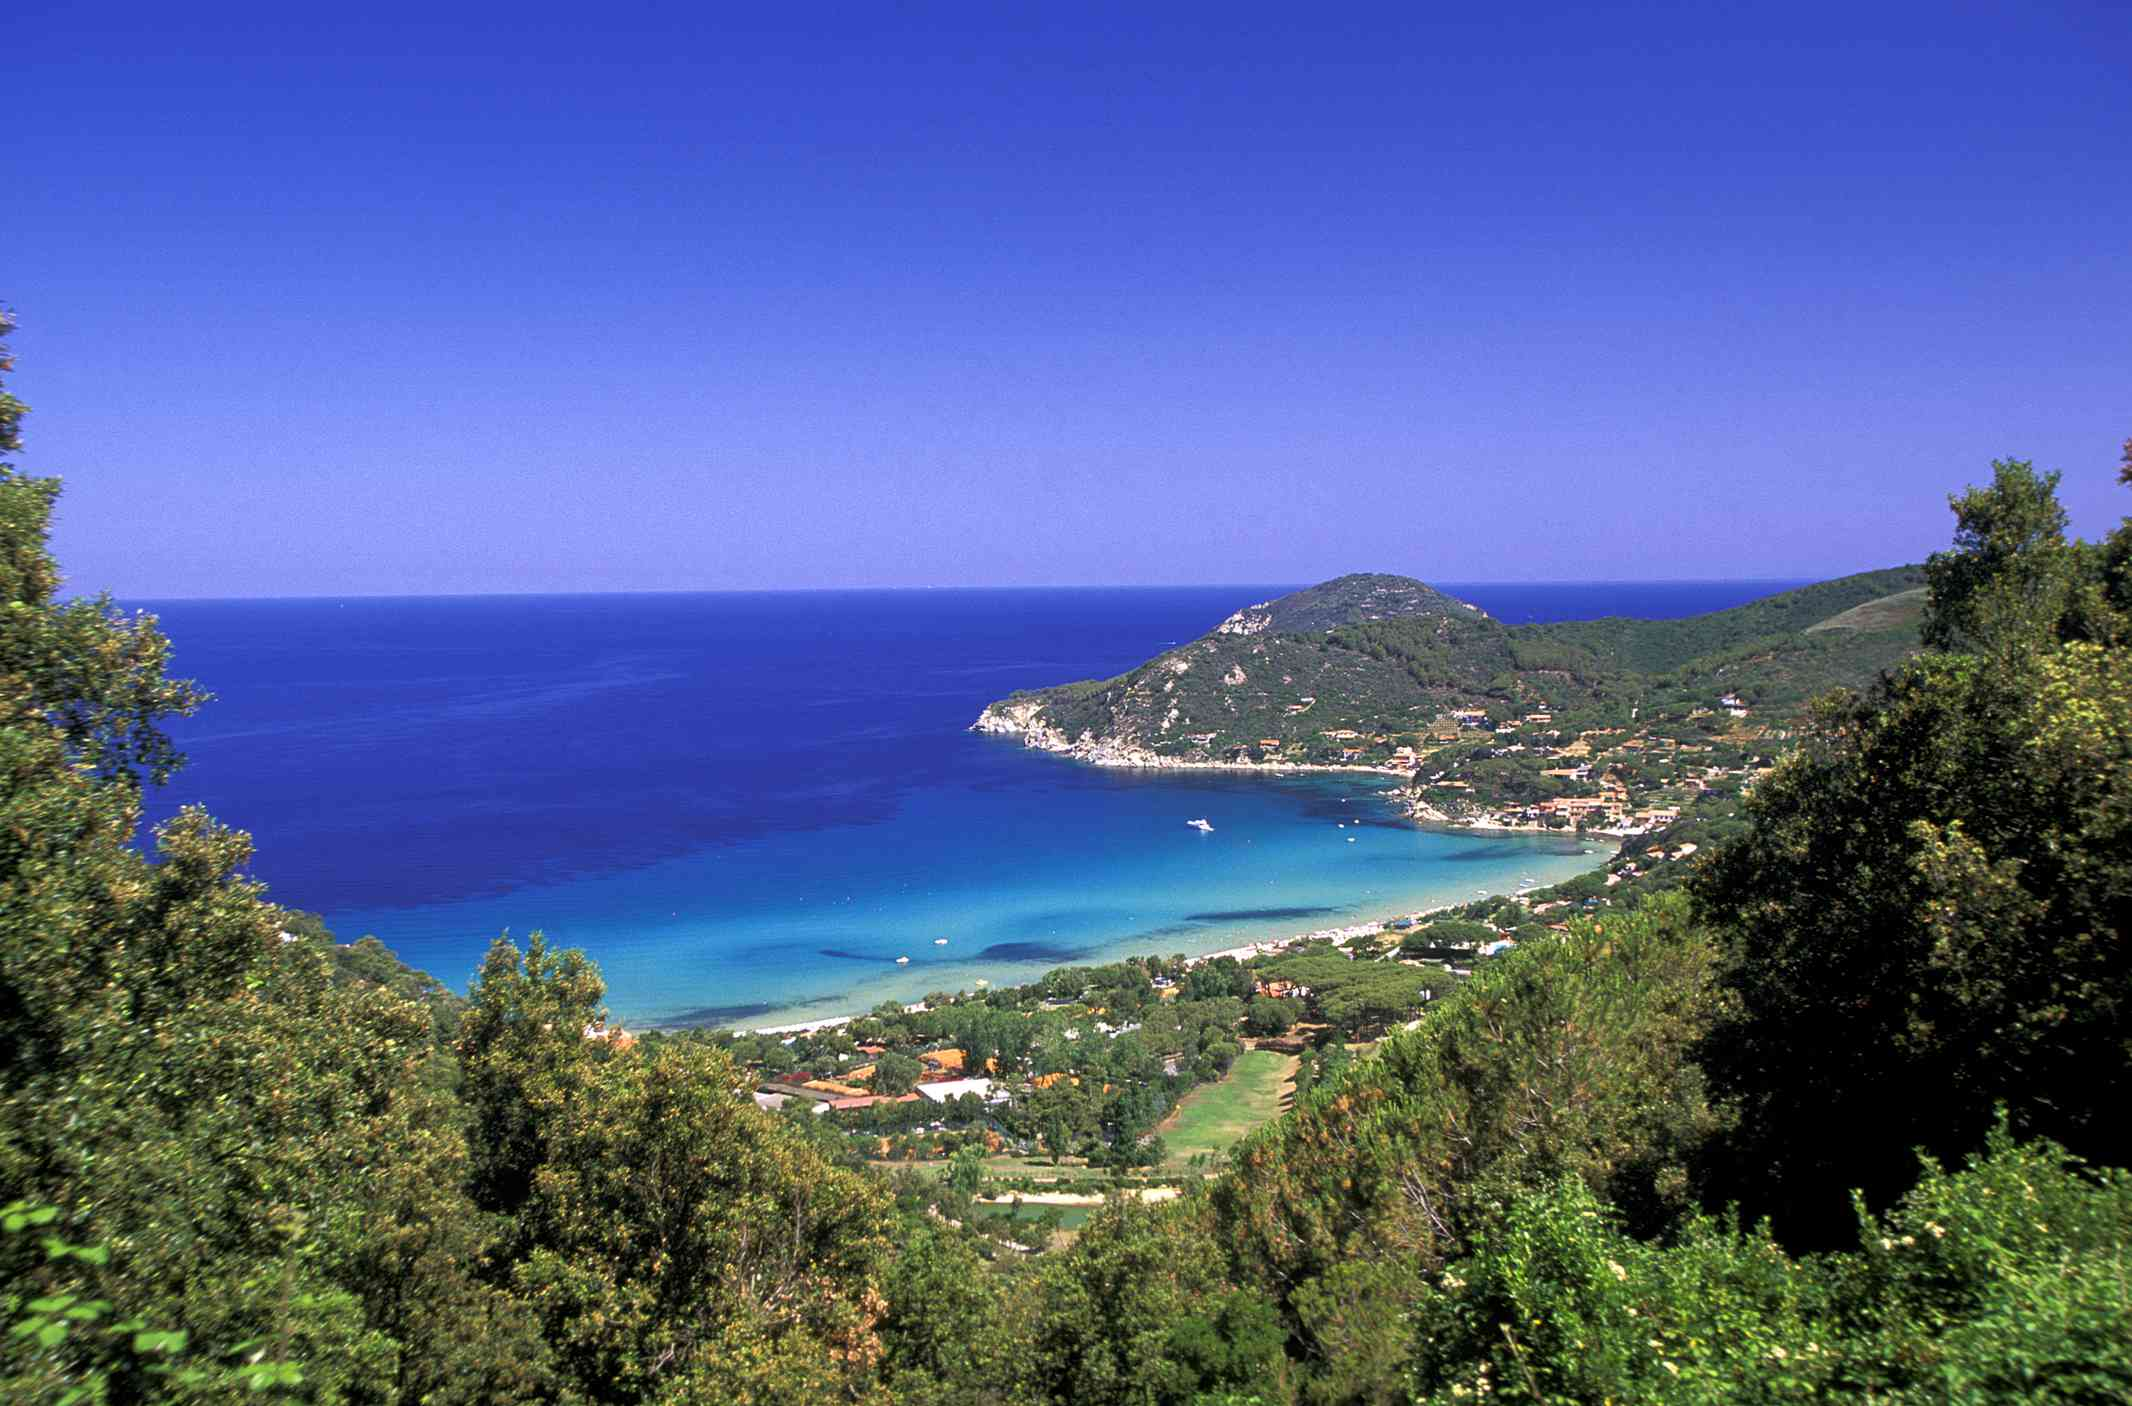 Long view of Biodola Bay and Beach, Elba